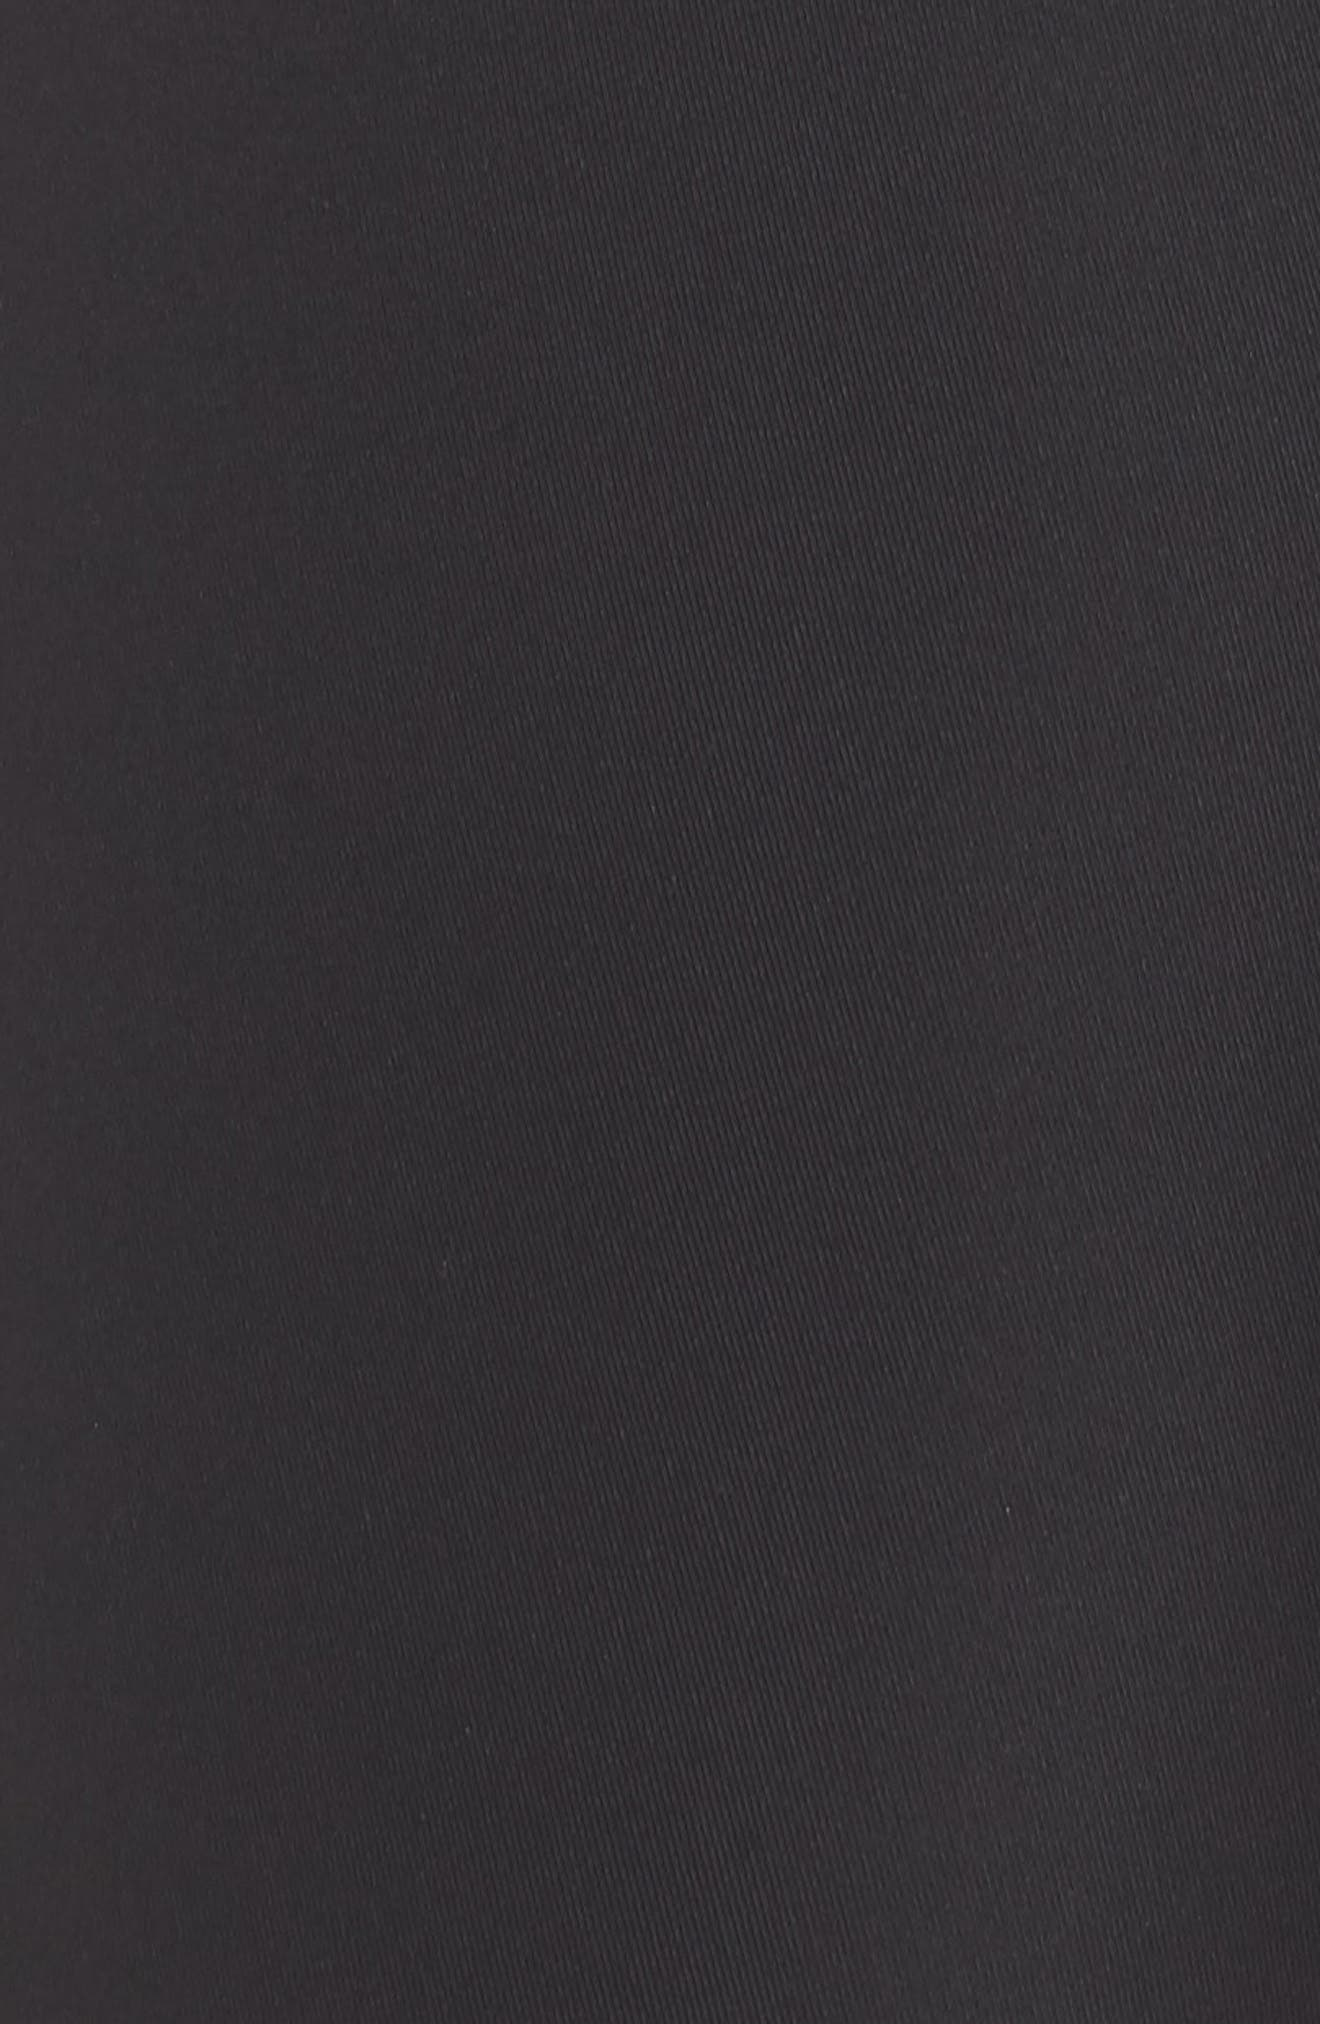 Constellation Print Crop Leggings,                             Alternate thumbnail 3, color,                             Black Desert Pearl Print